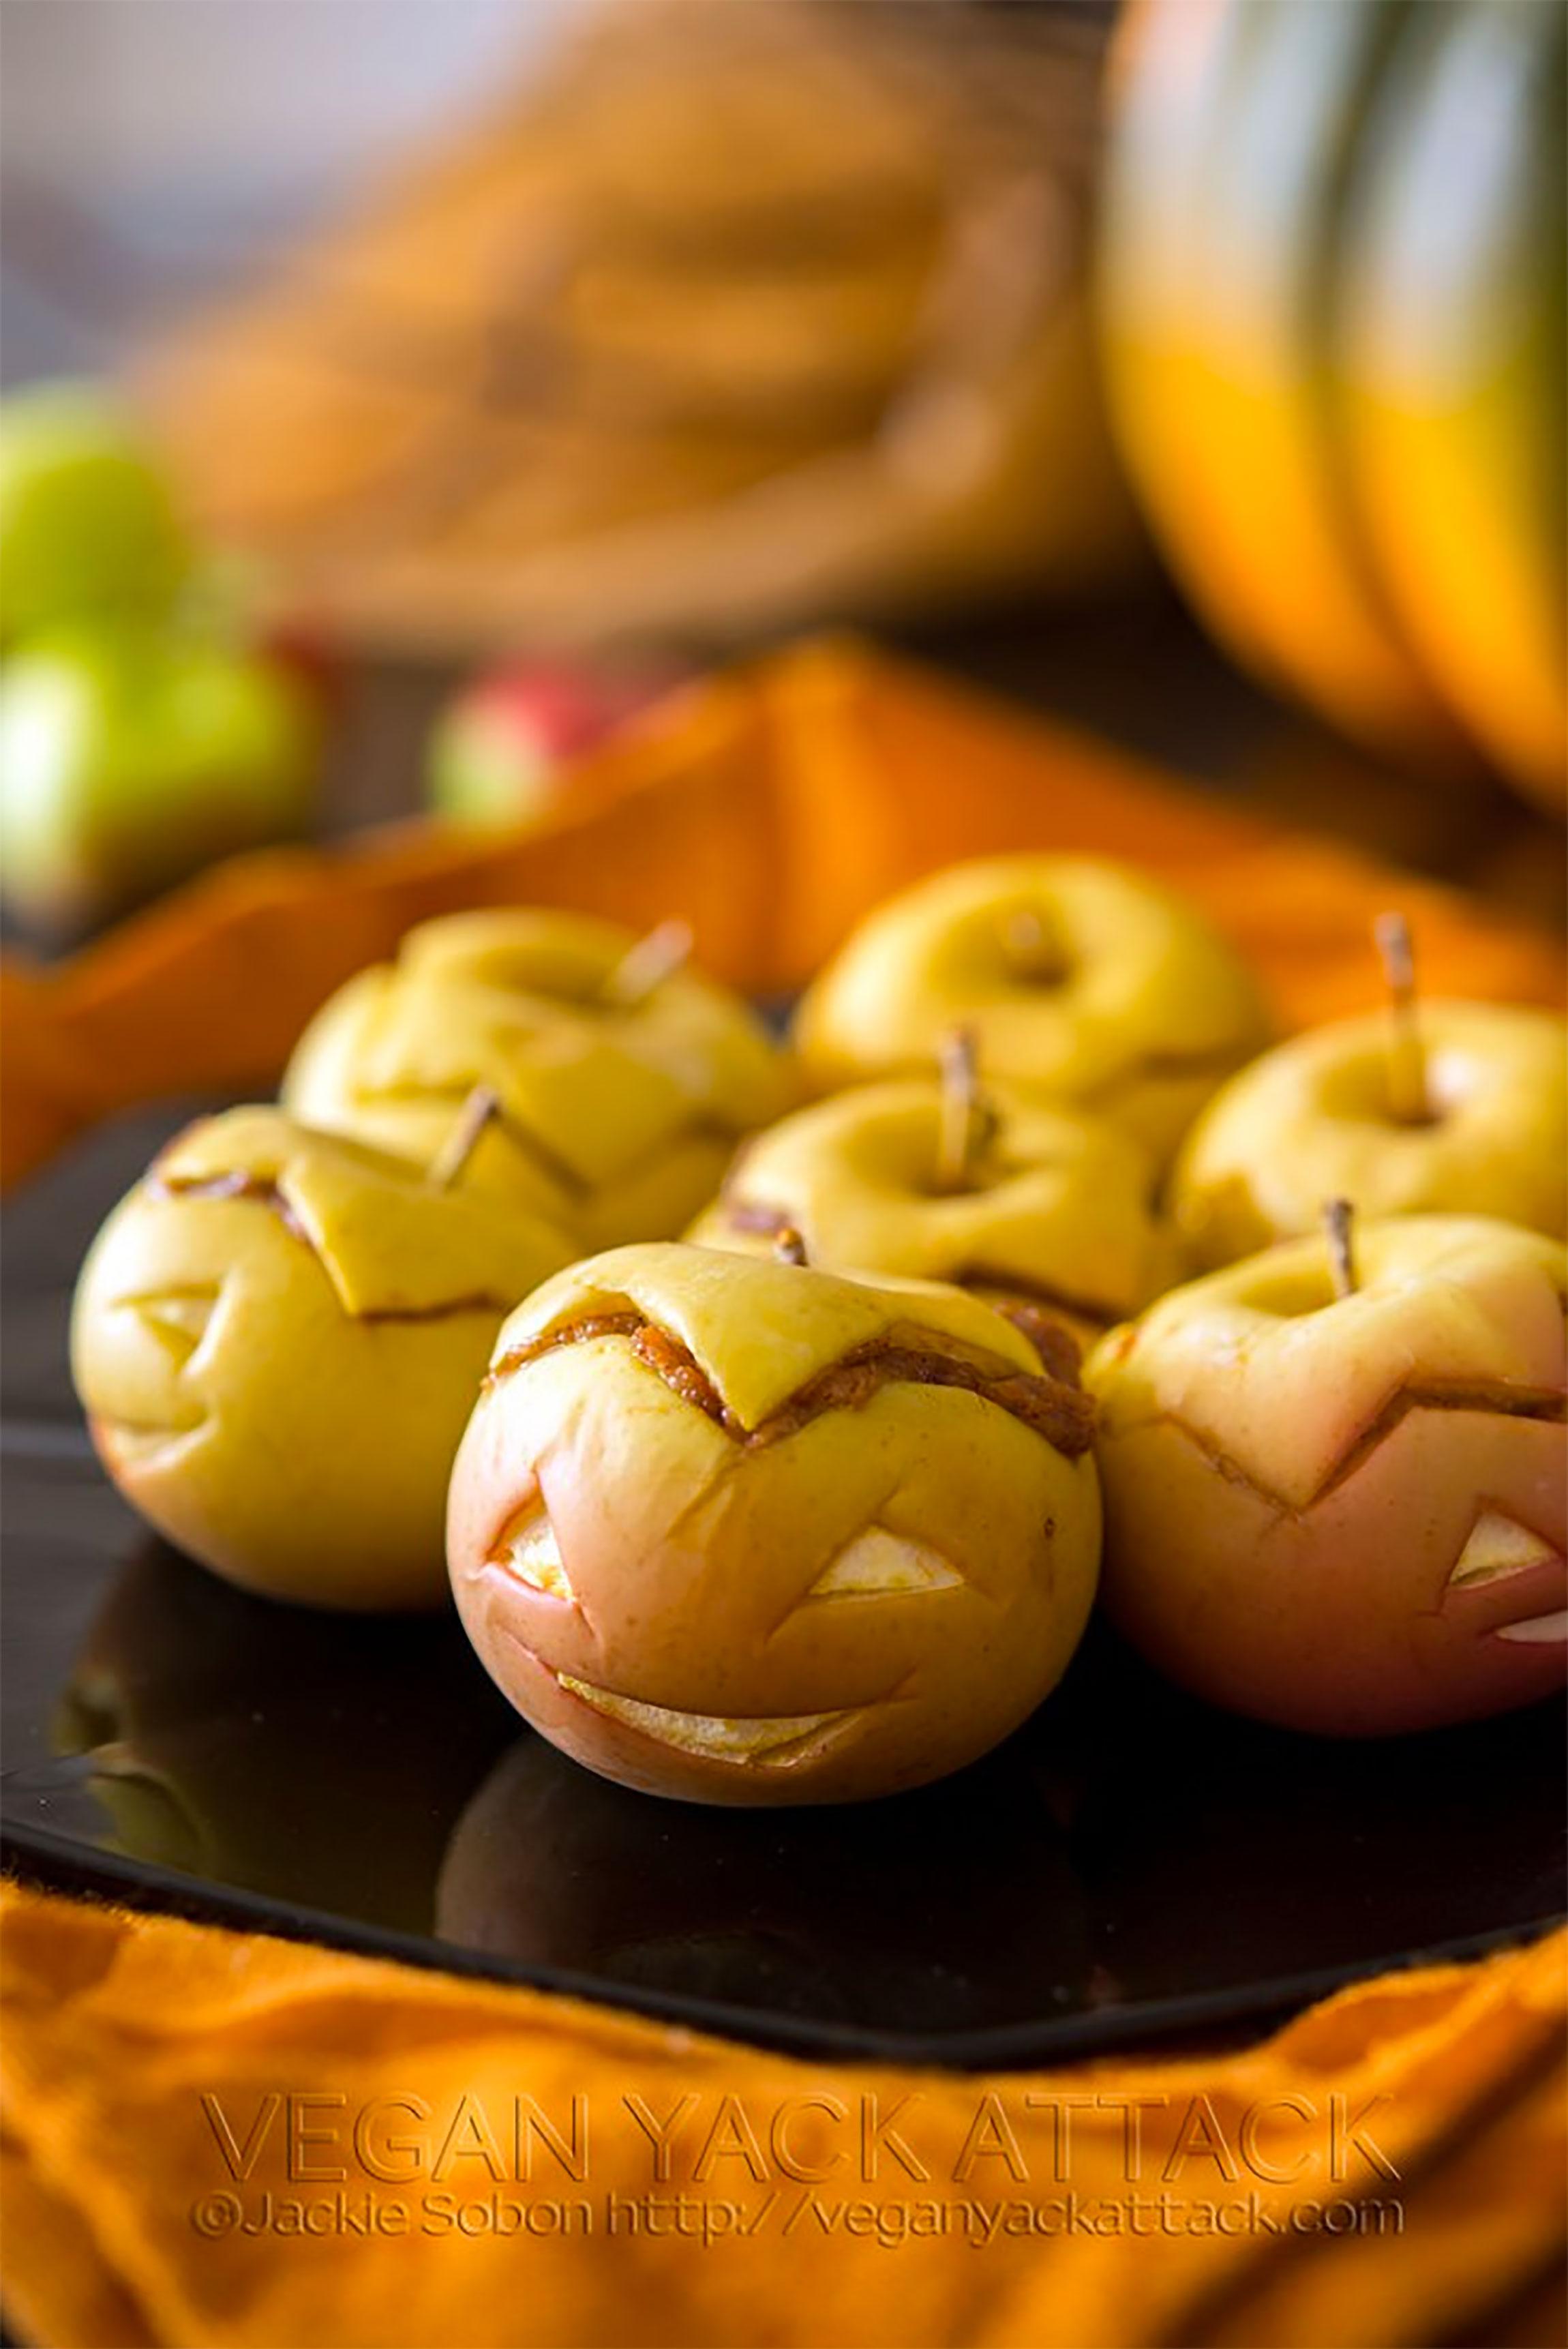 Healthy Halloween Snacks & Treats: Peanut Butter Apple Lanterns